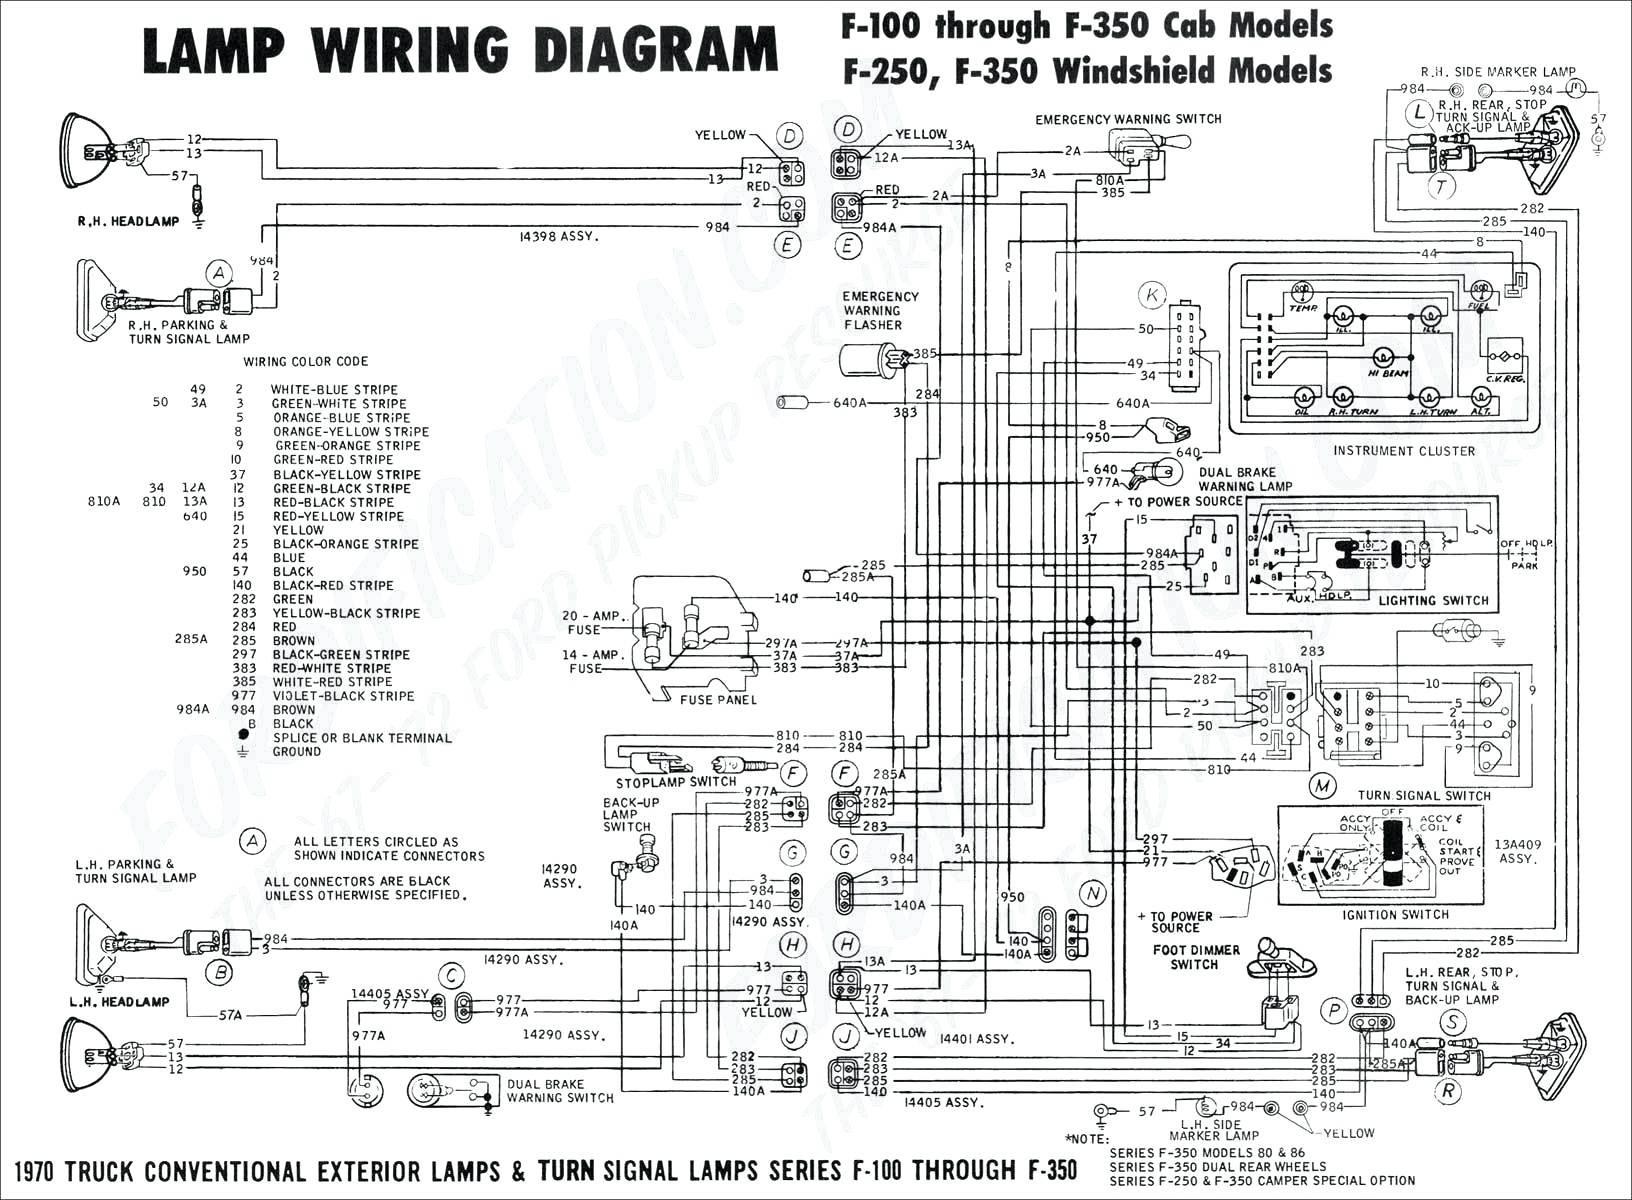 Honda Shadow 1100 Wiring Diagram Ih 585 Wiring Diagram Experts Wiring Diagram • Of Honda Shadow 1100 Wiring Diagram